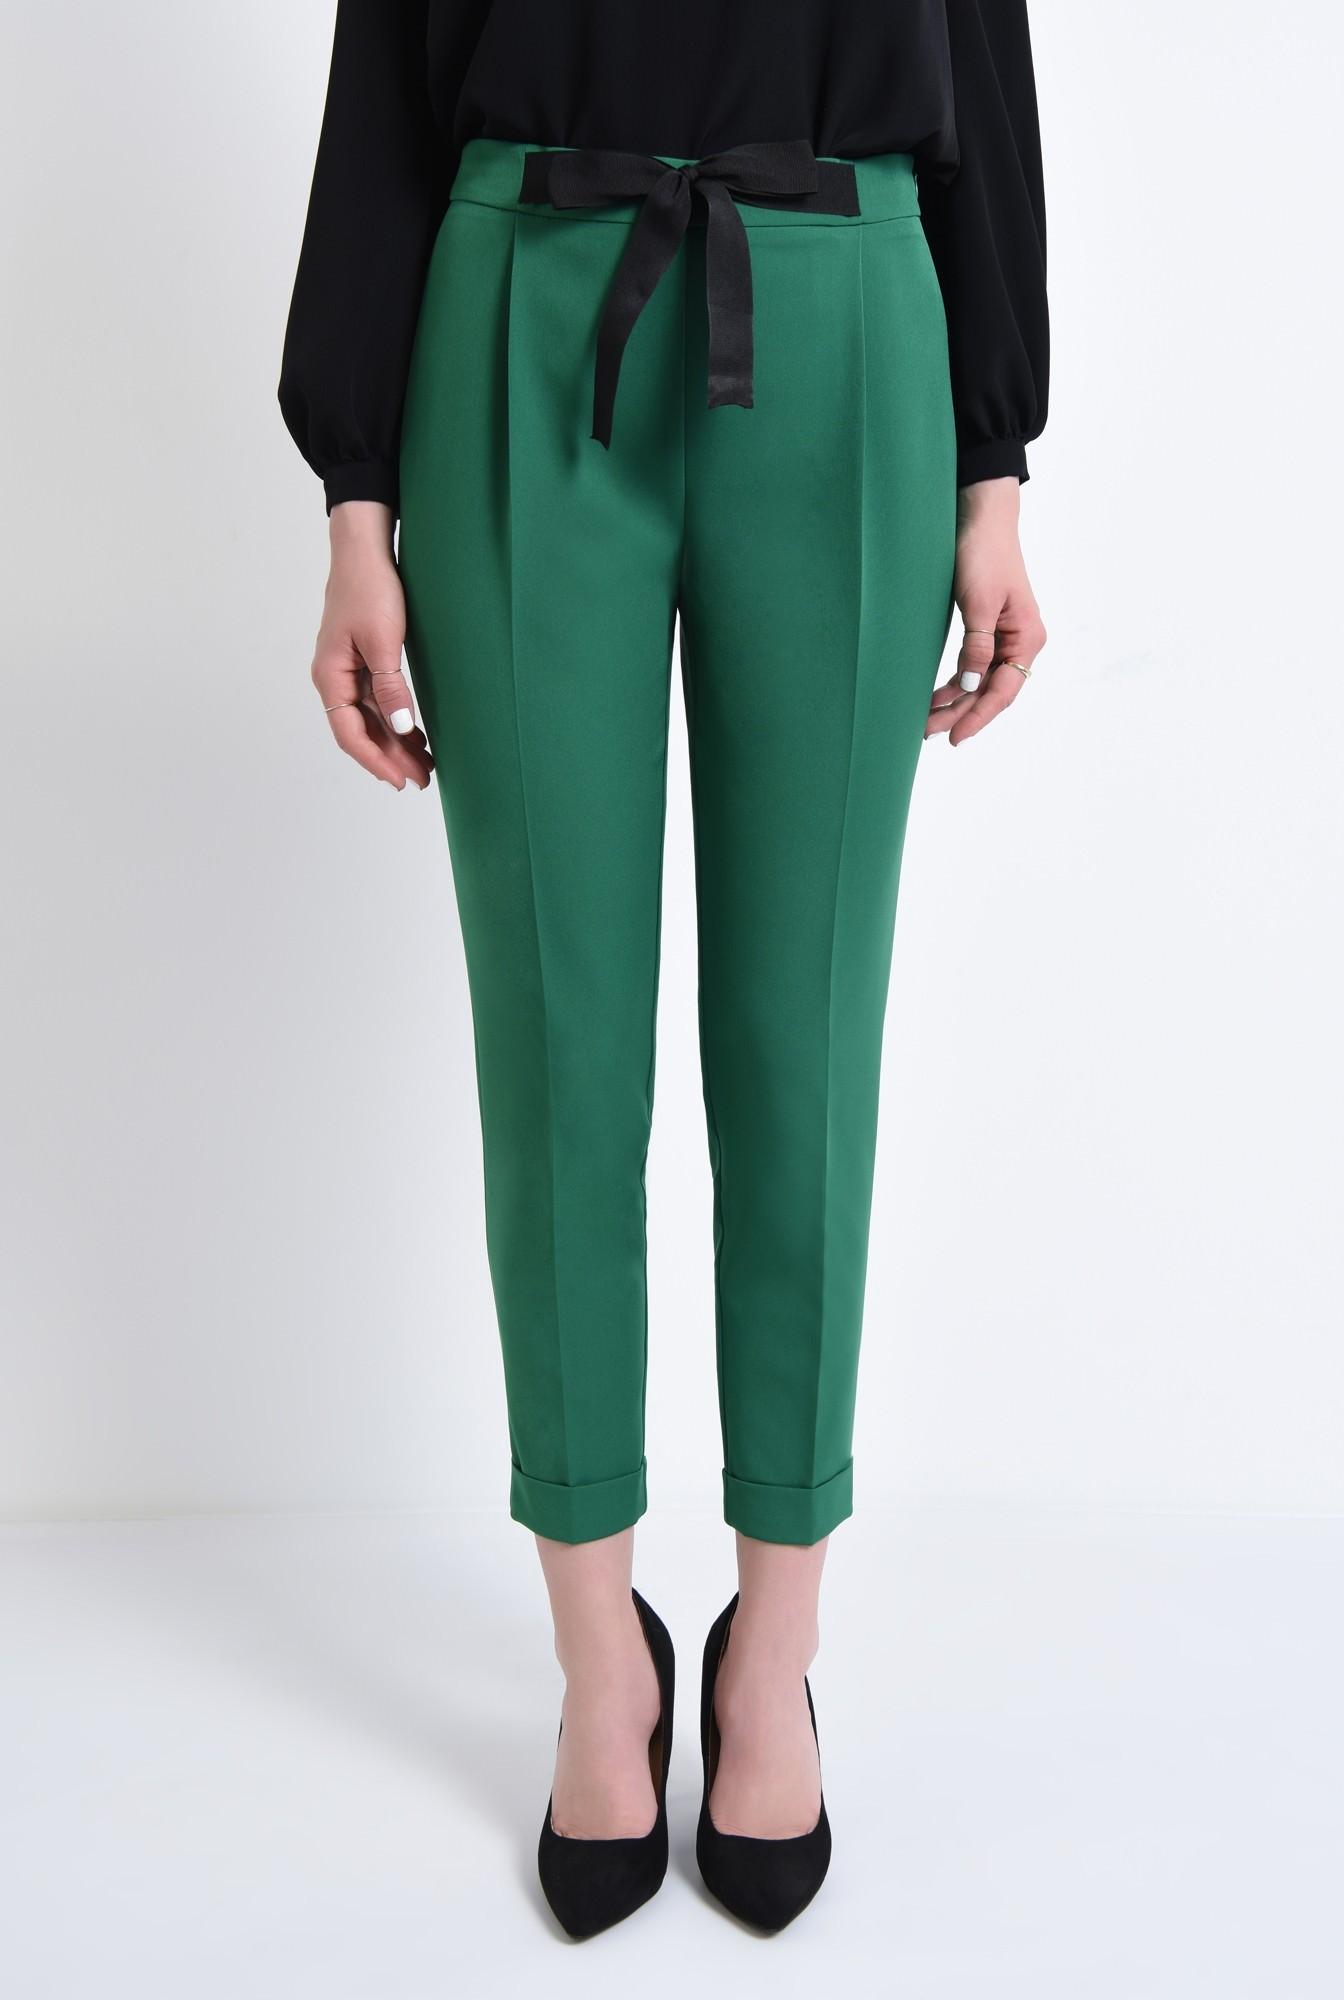 2 - Pantaloni casual, verde